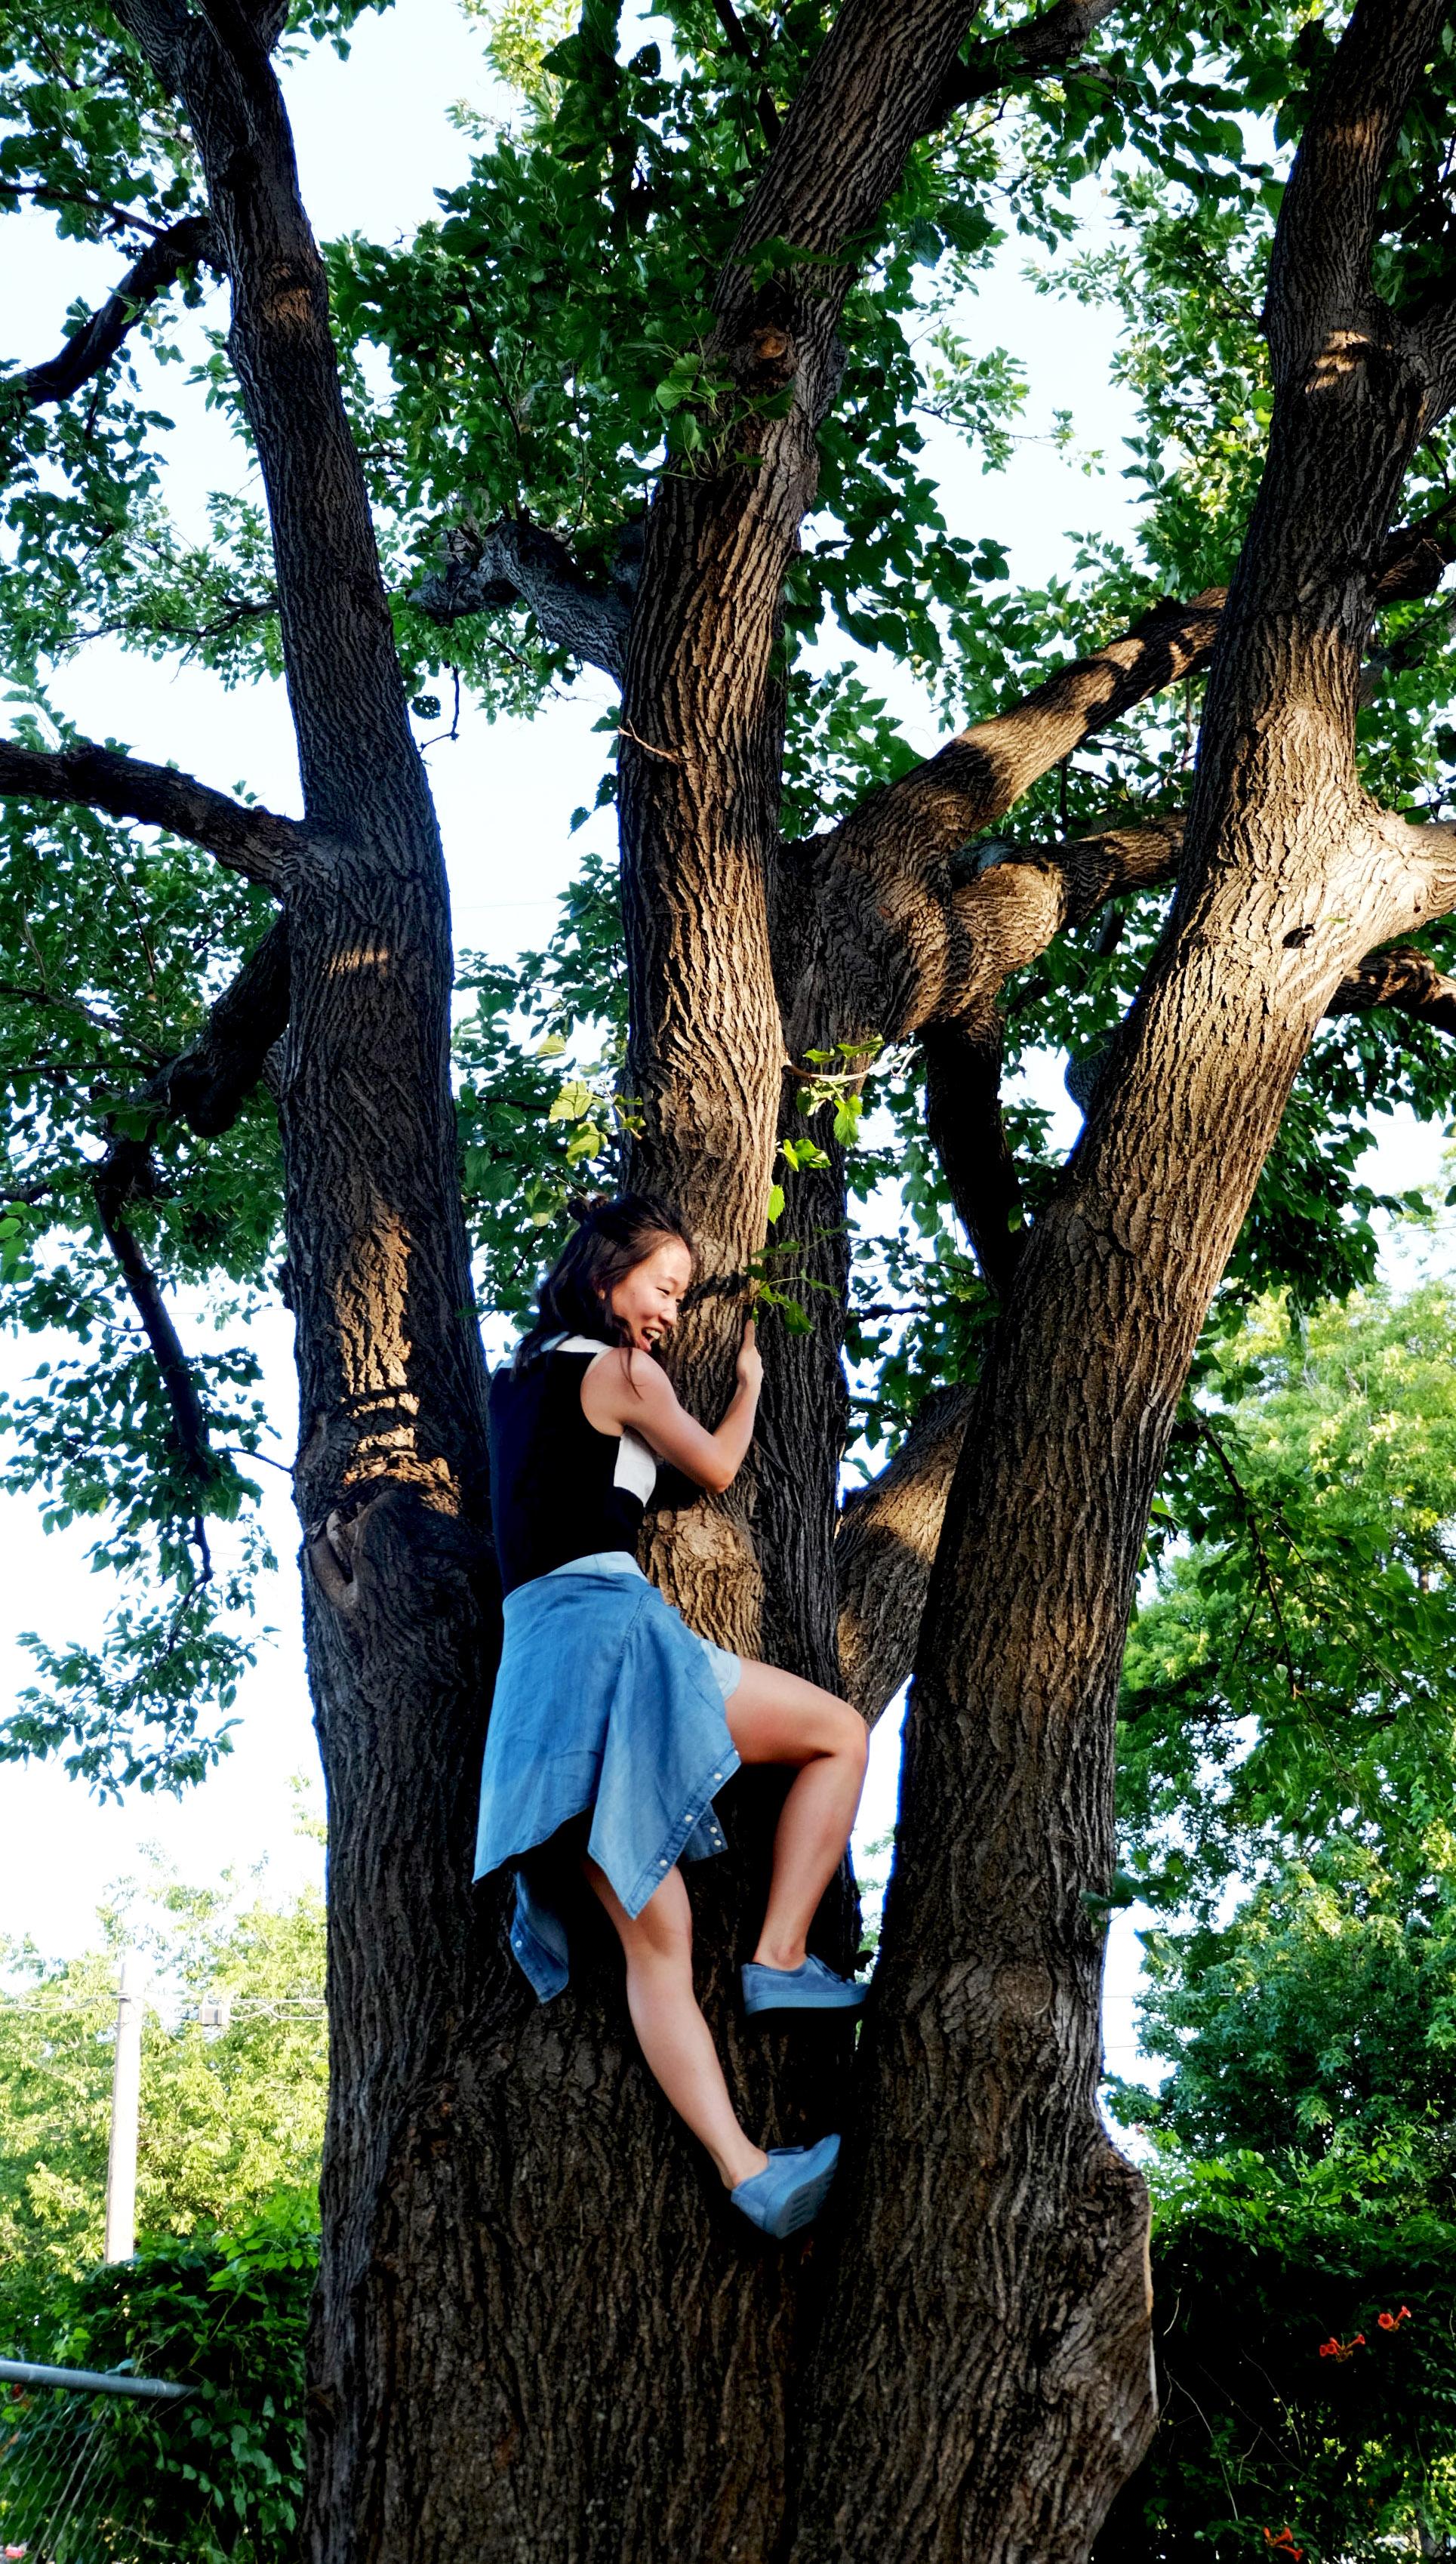 In Dallas I ...almost fell off a tree.